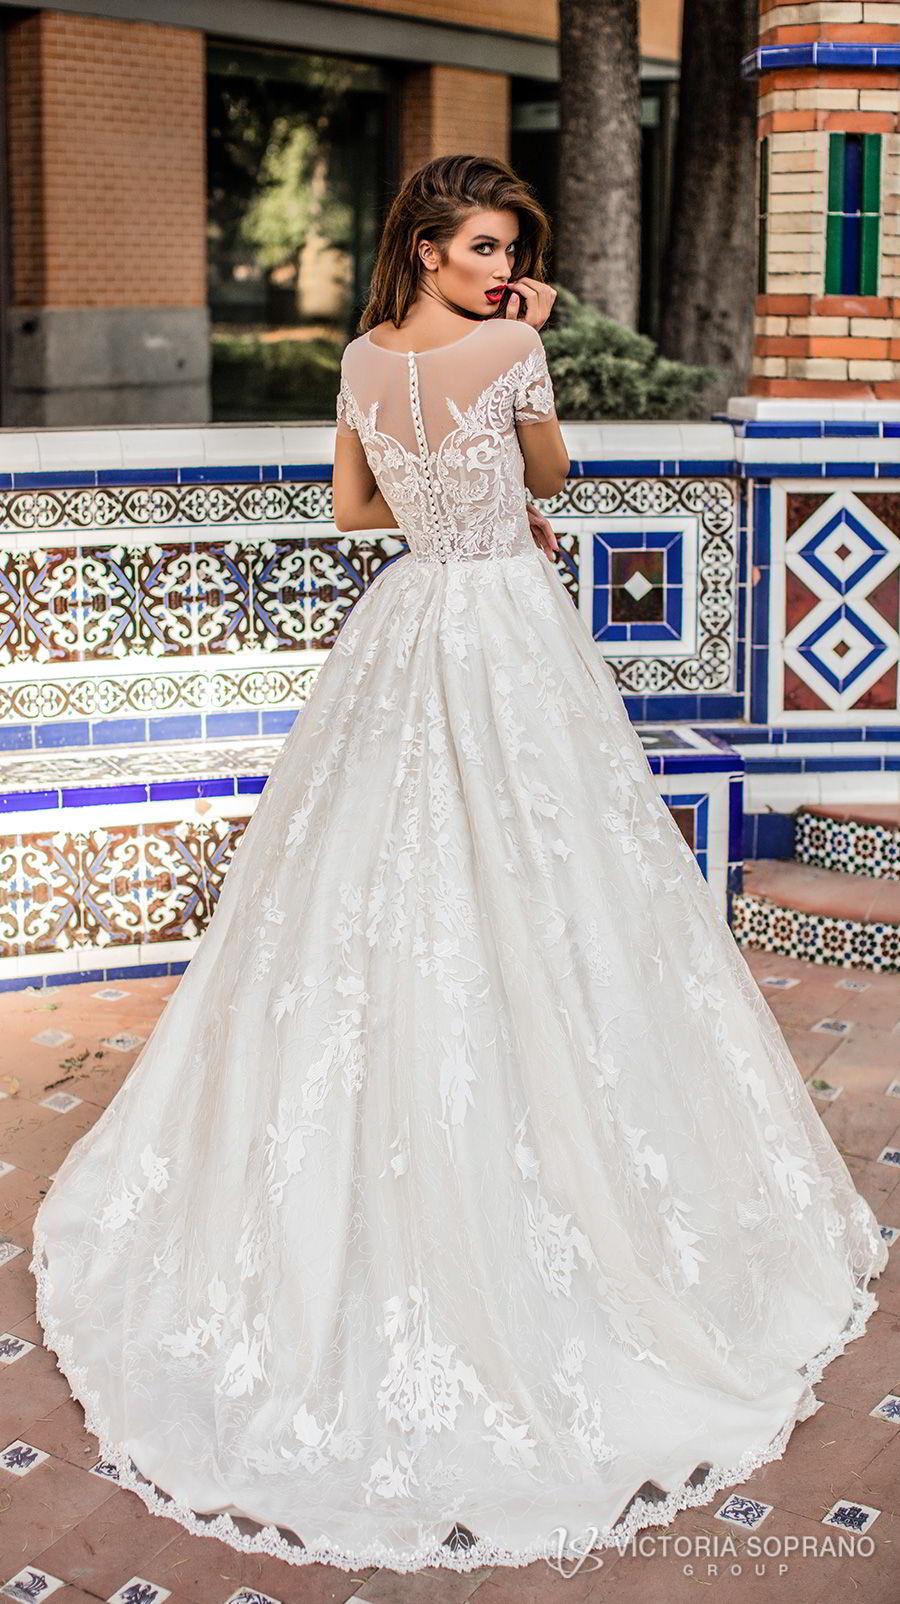 victoria soprano 2018 bridal short sleeves illusion jewel sweetheart neckline heavily embellished bodice romantic a  line wedding dress with pockets sheer lace back chapel train (vivian) bv